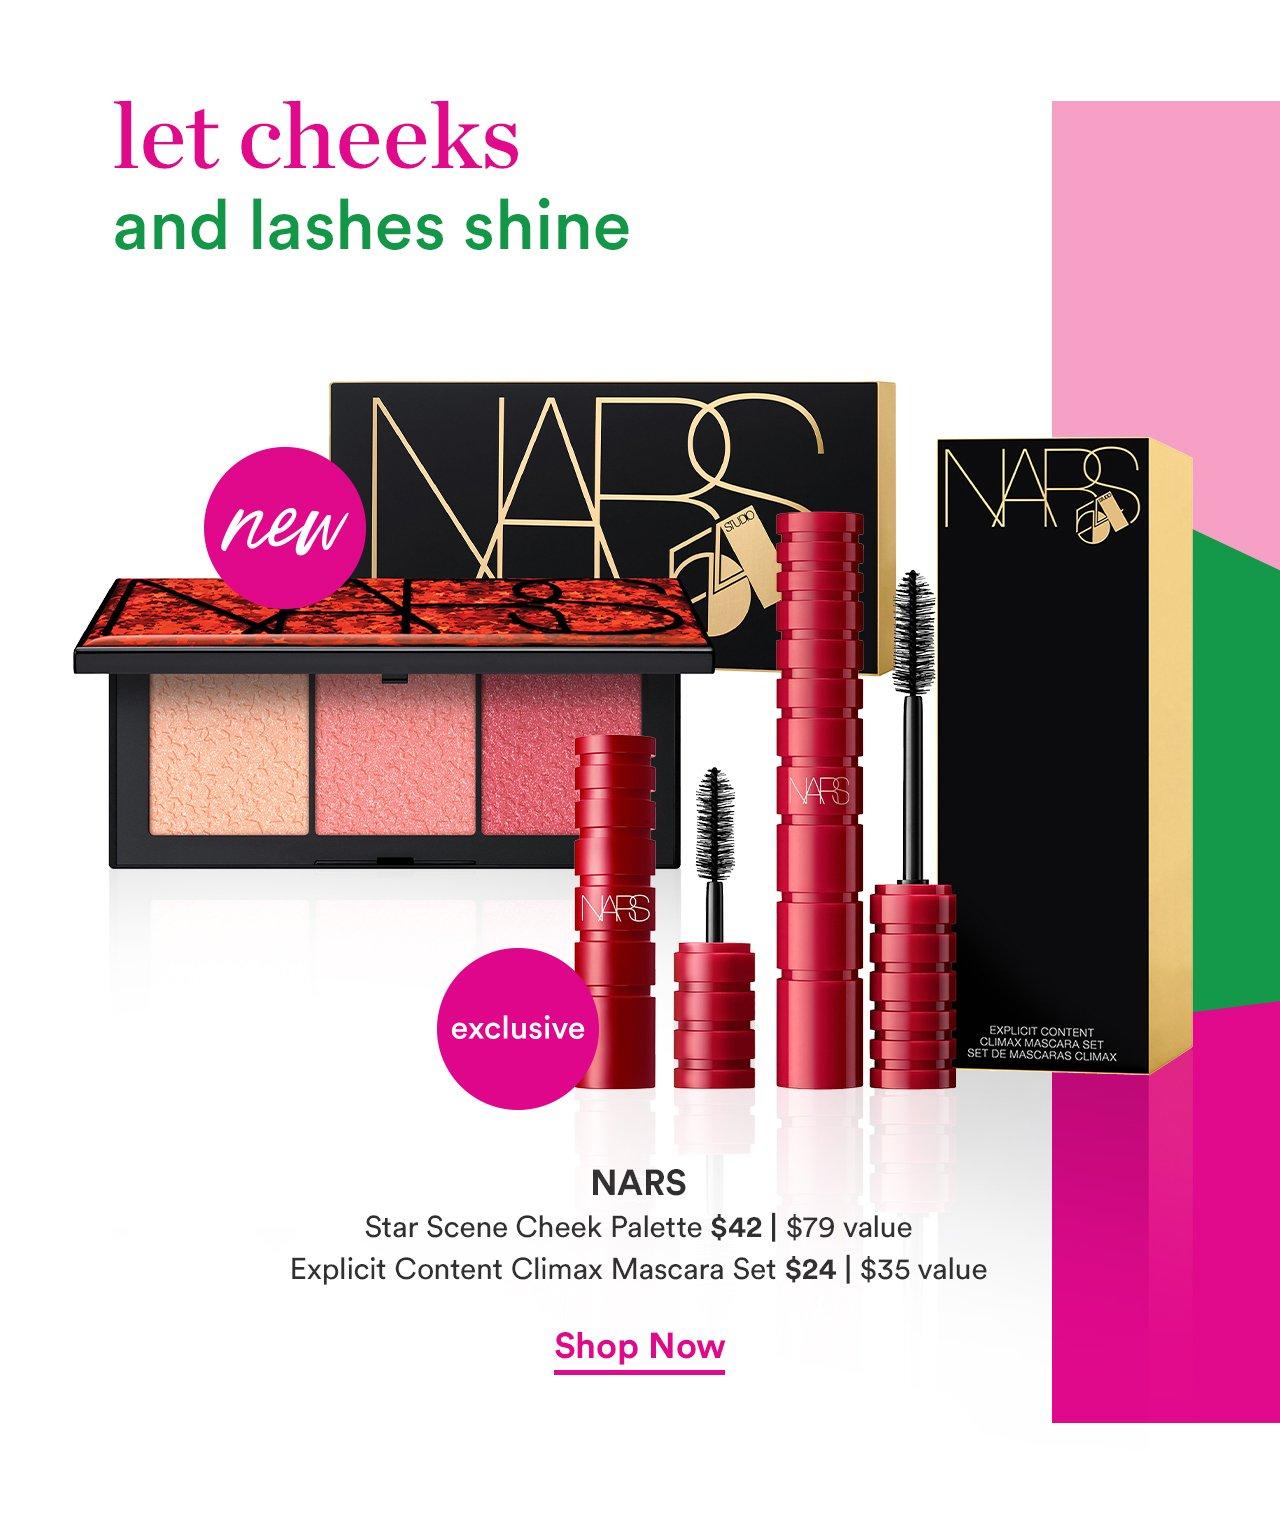 NARS | Star Scene Cheek Palette $42 | $79 Value | Explicit Content Climax Mascara Set $24 | $35 Value